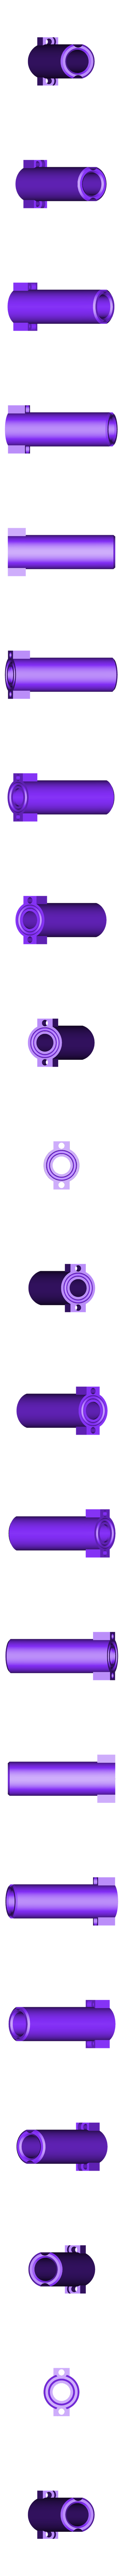 barrel.stl Download free STL file Foam Dart GUN (pullback loading) • 3D print design, senns